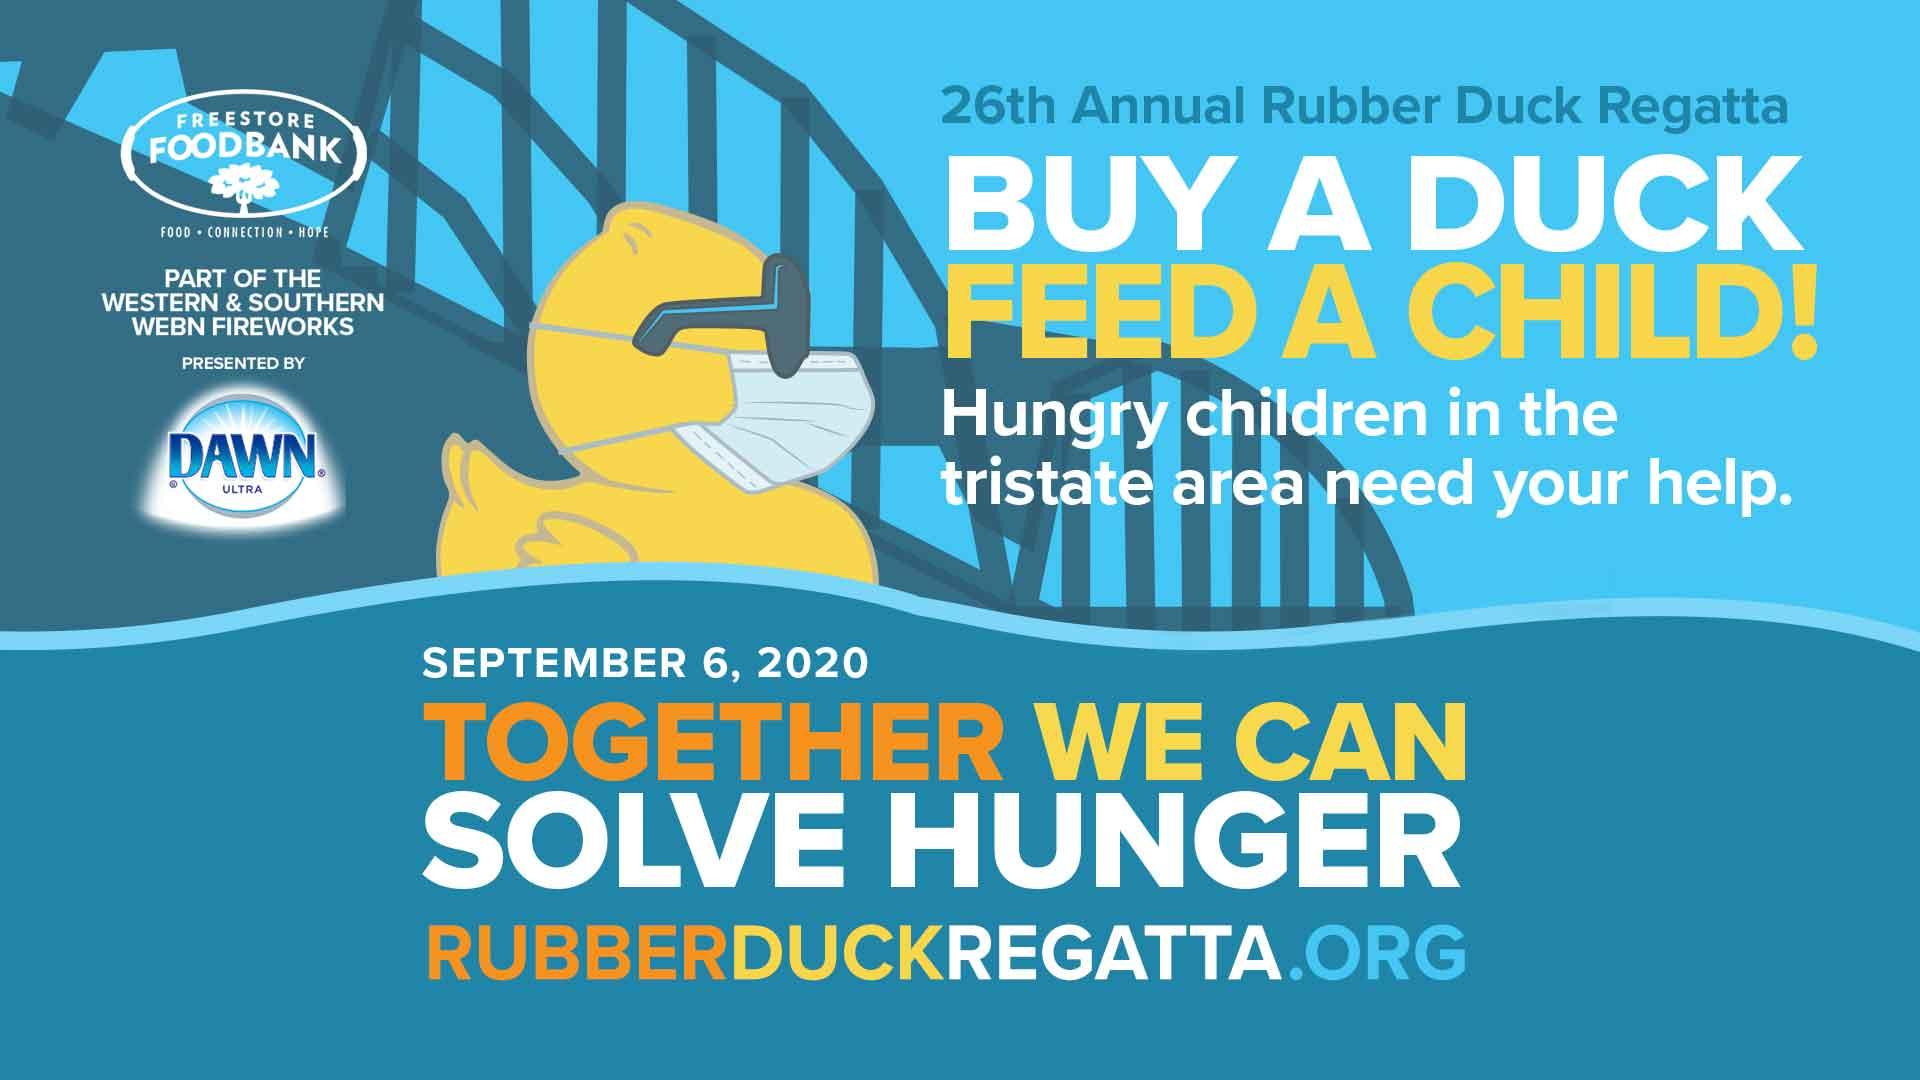 Rubber Duck Regatta - Buy A Duck - Feed A Child